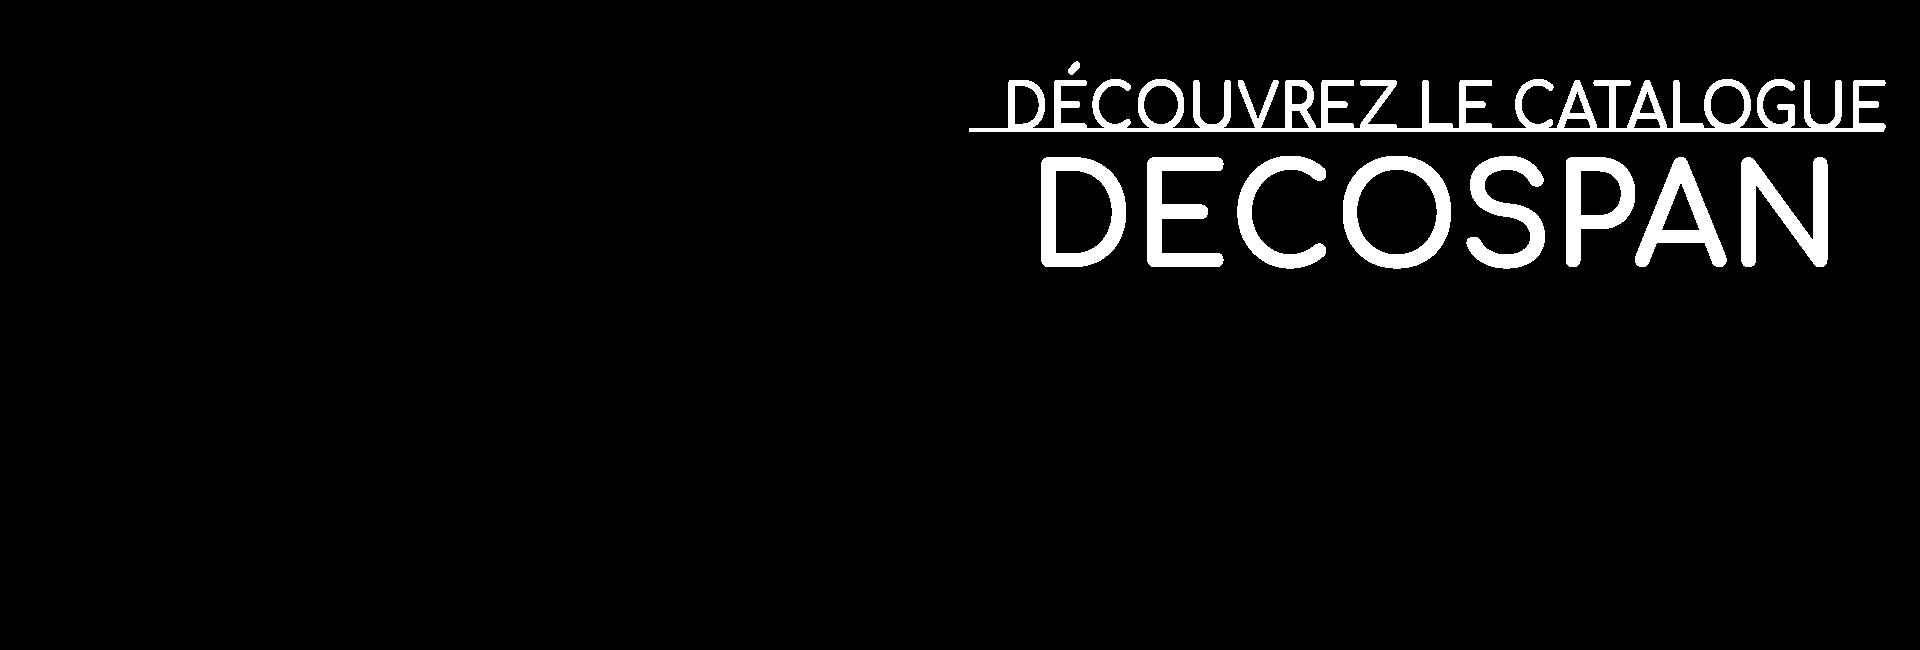 slider-decospan-texte.png